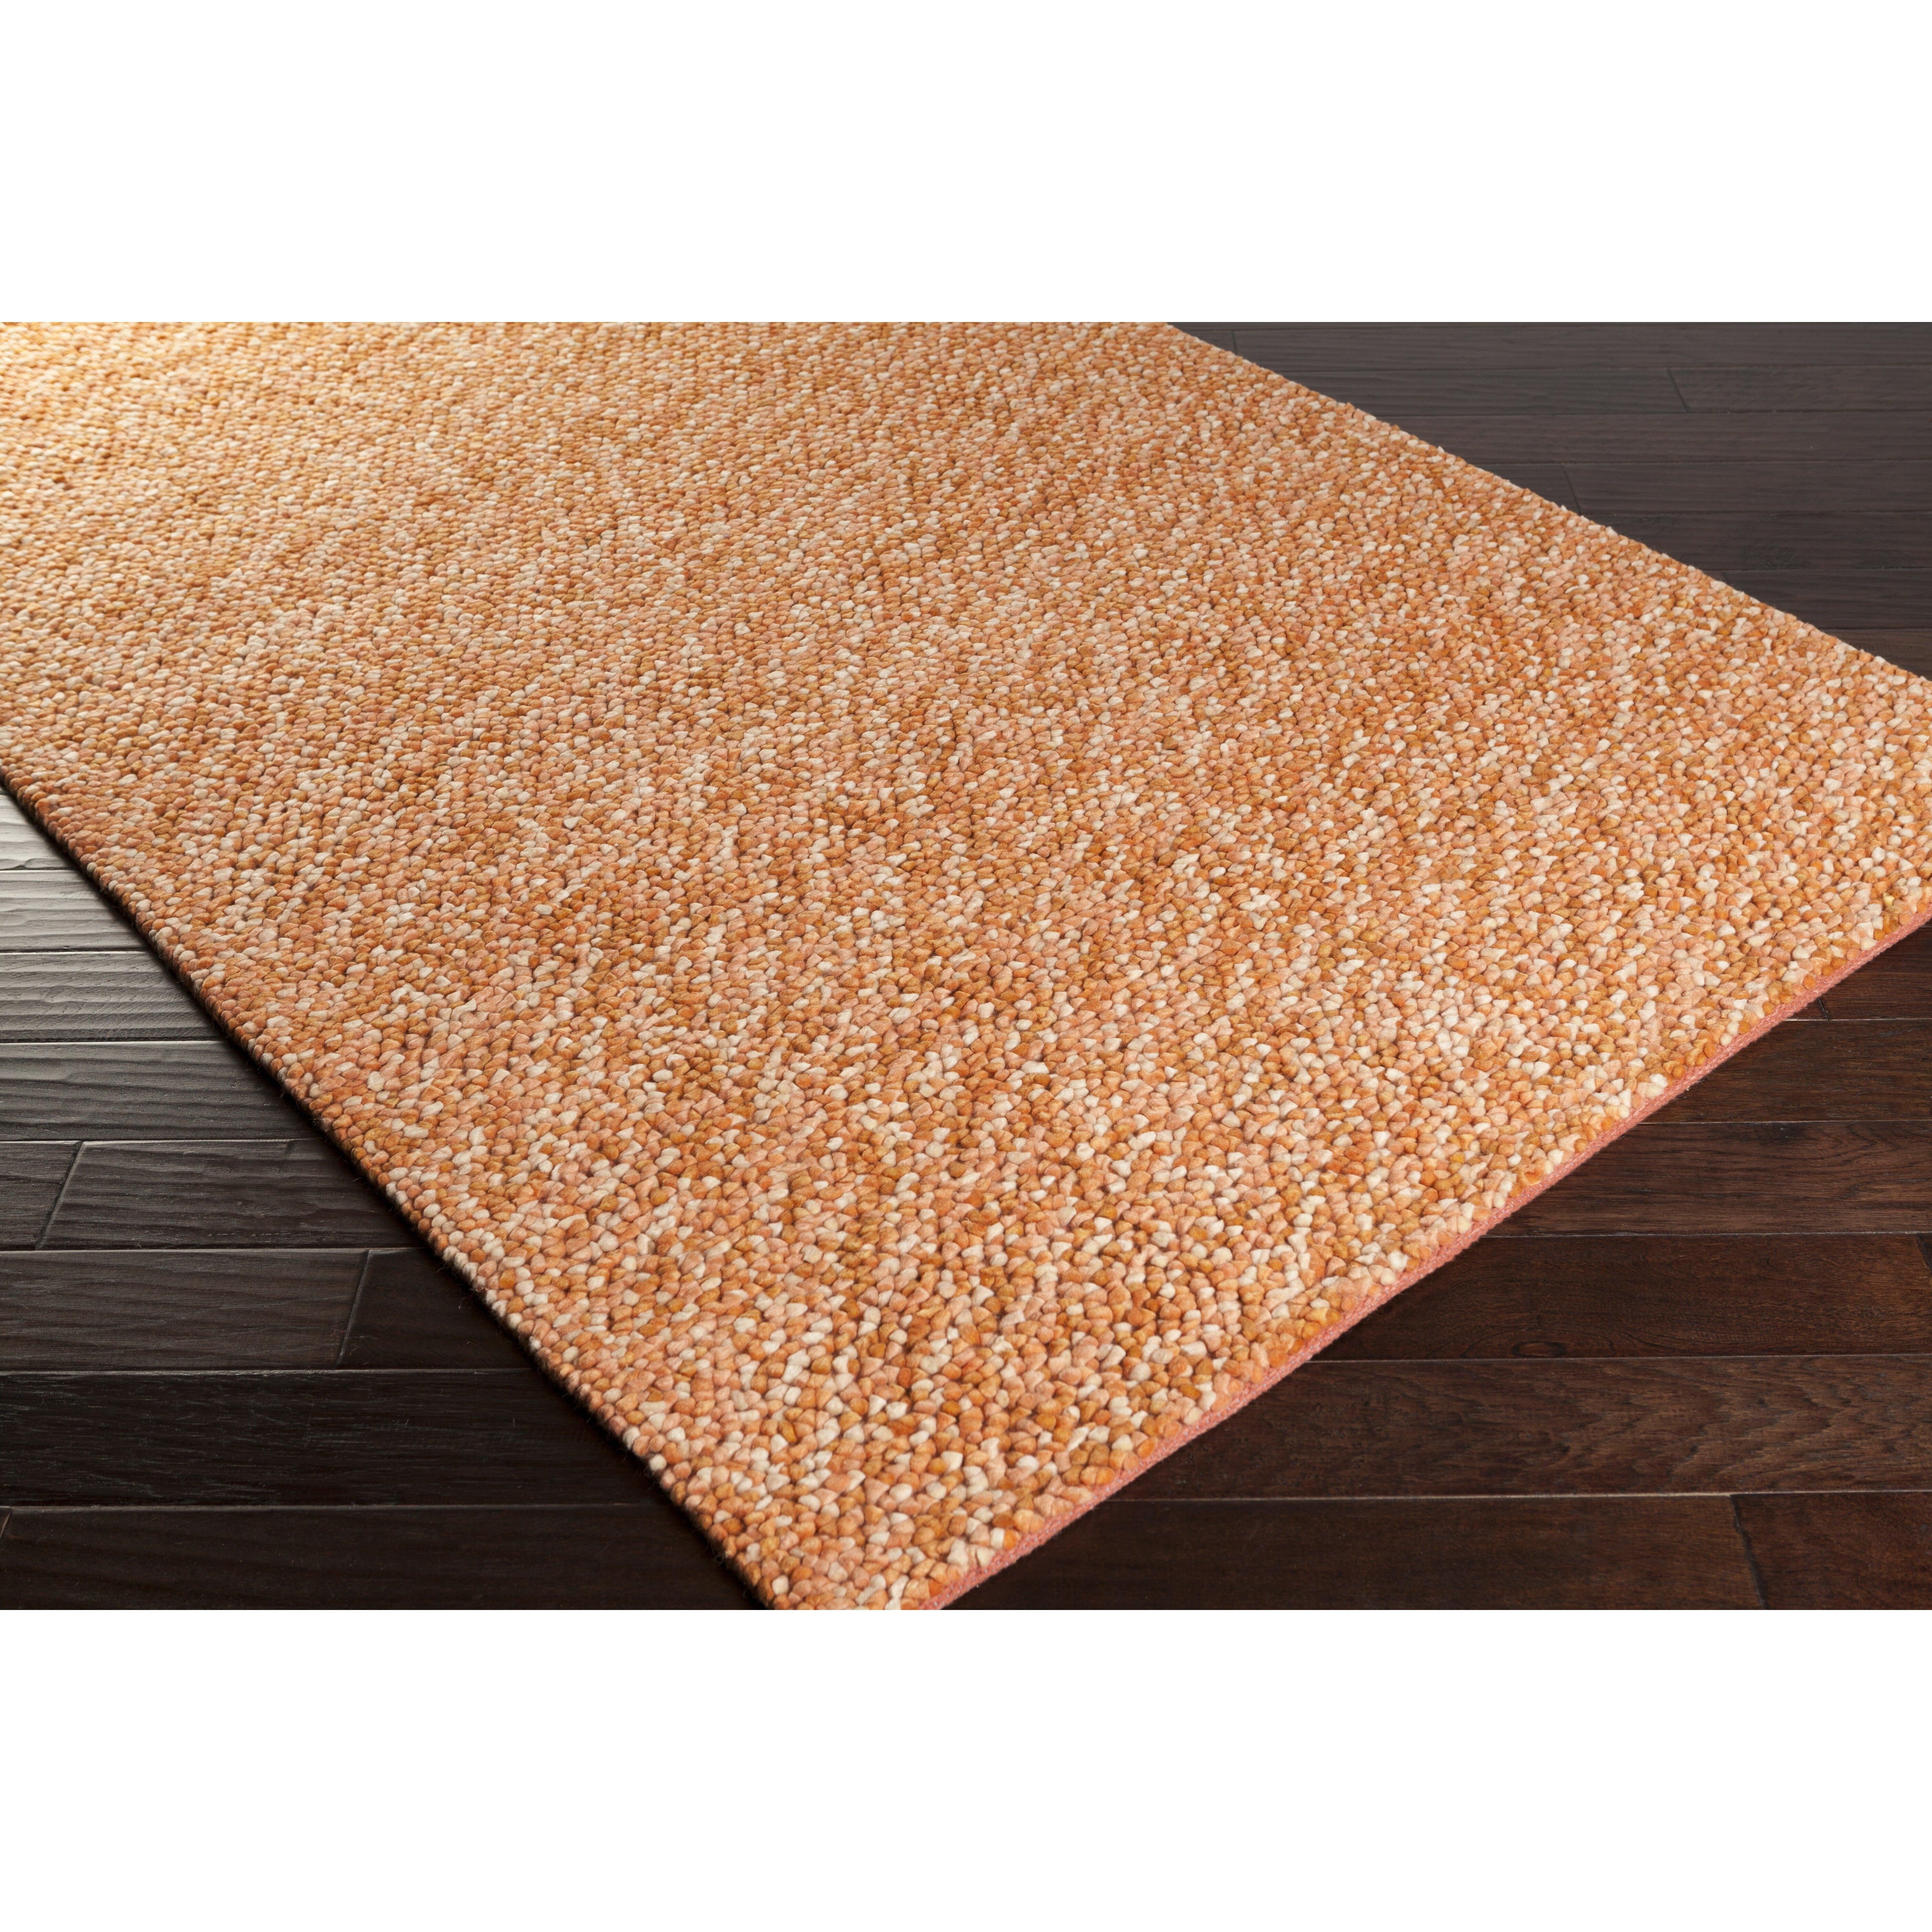 Surya Confetti Burnt Orange/Beige Area Rug